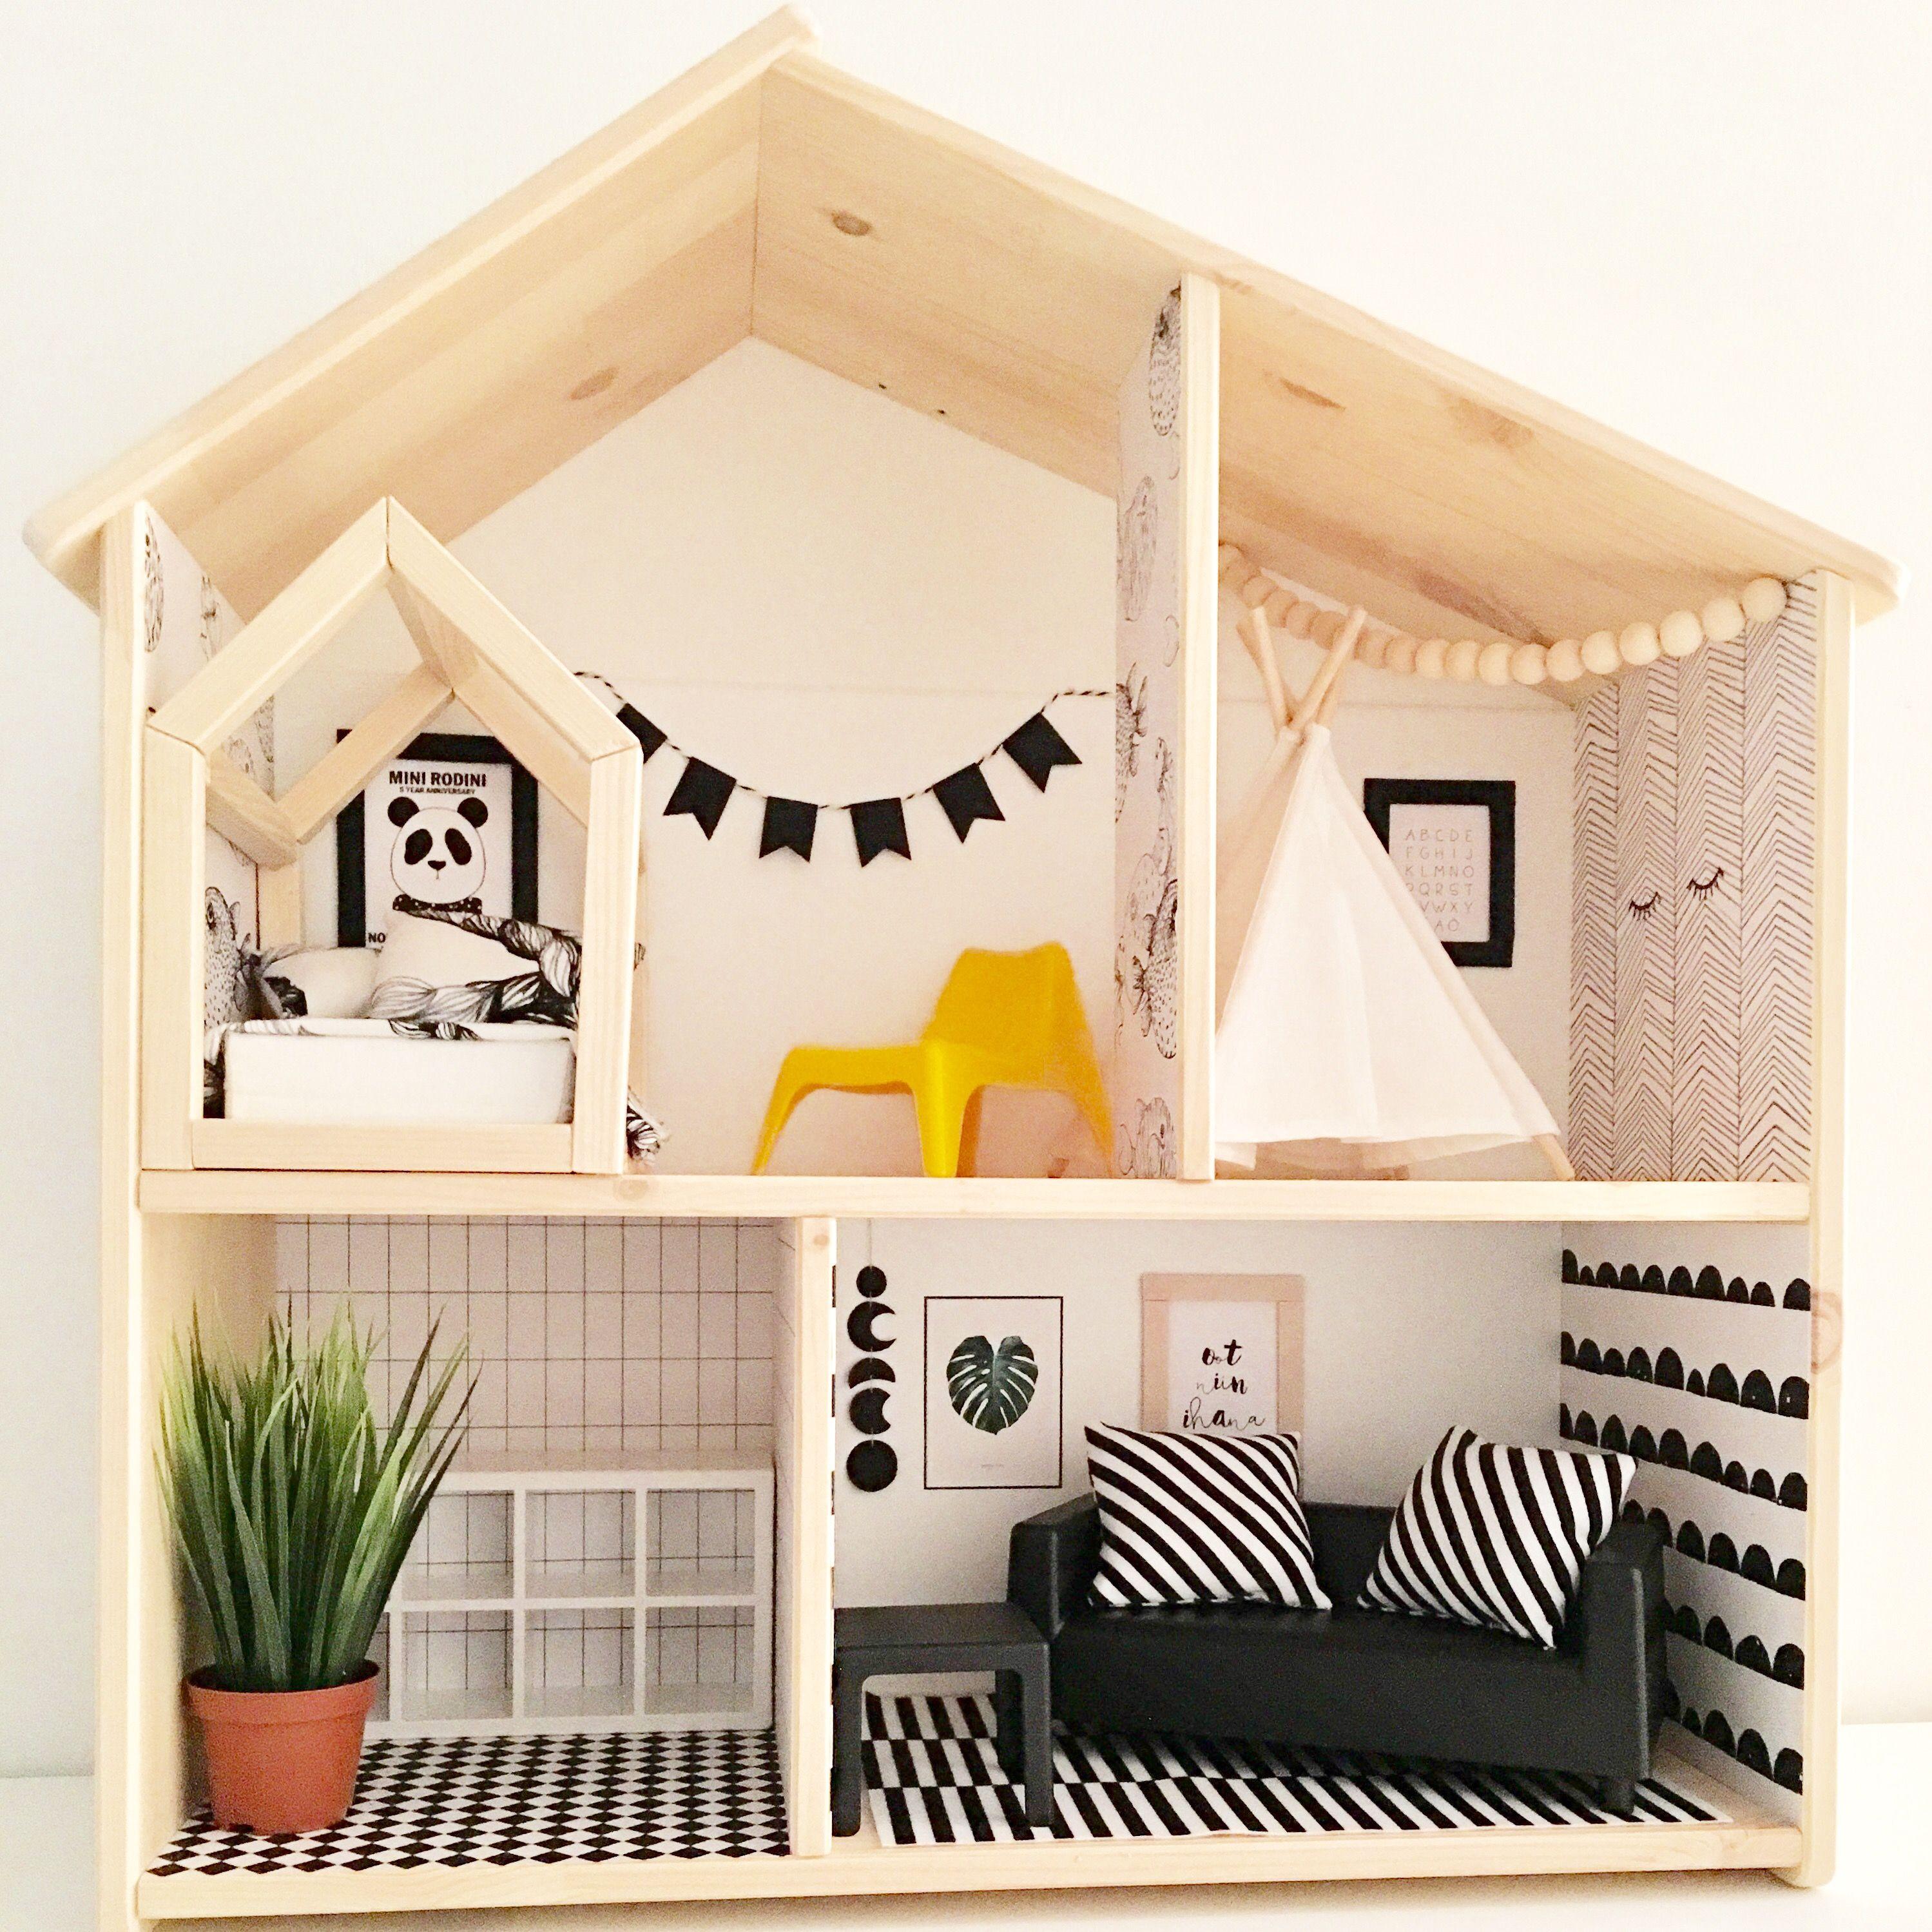 what a super cute dolls house toy revolution pinterest kinderzimmer geschenke f r. Black Bedroom Furniture Sets. Home Design Ideas